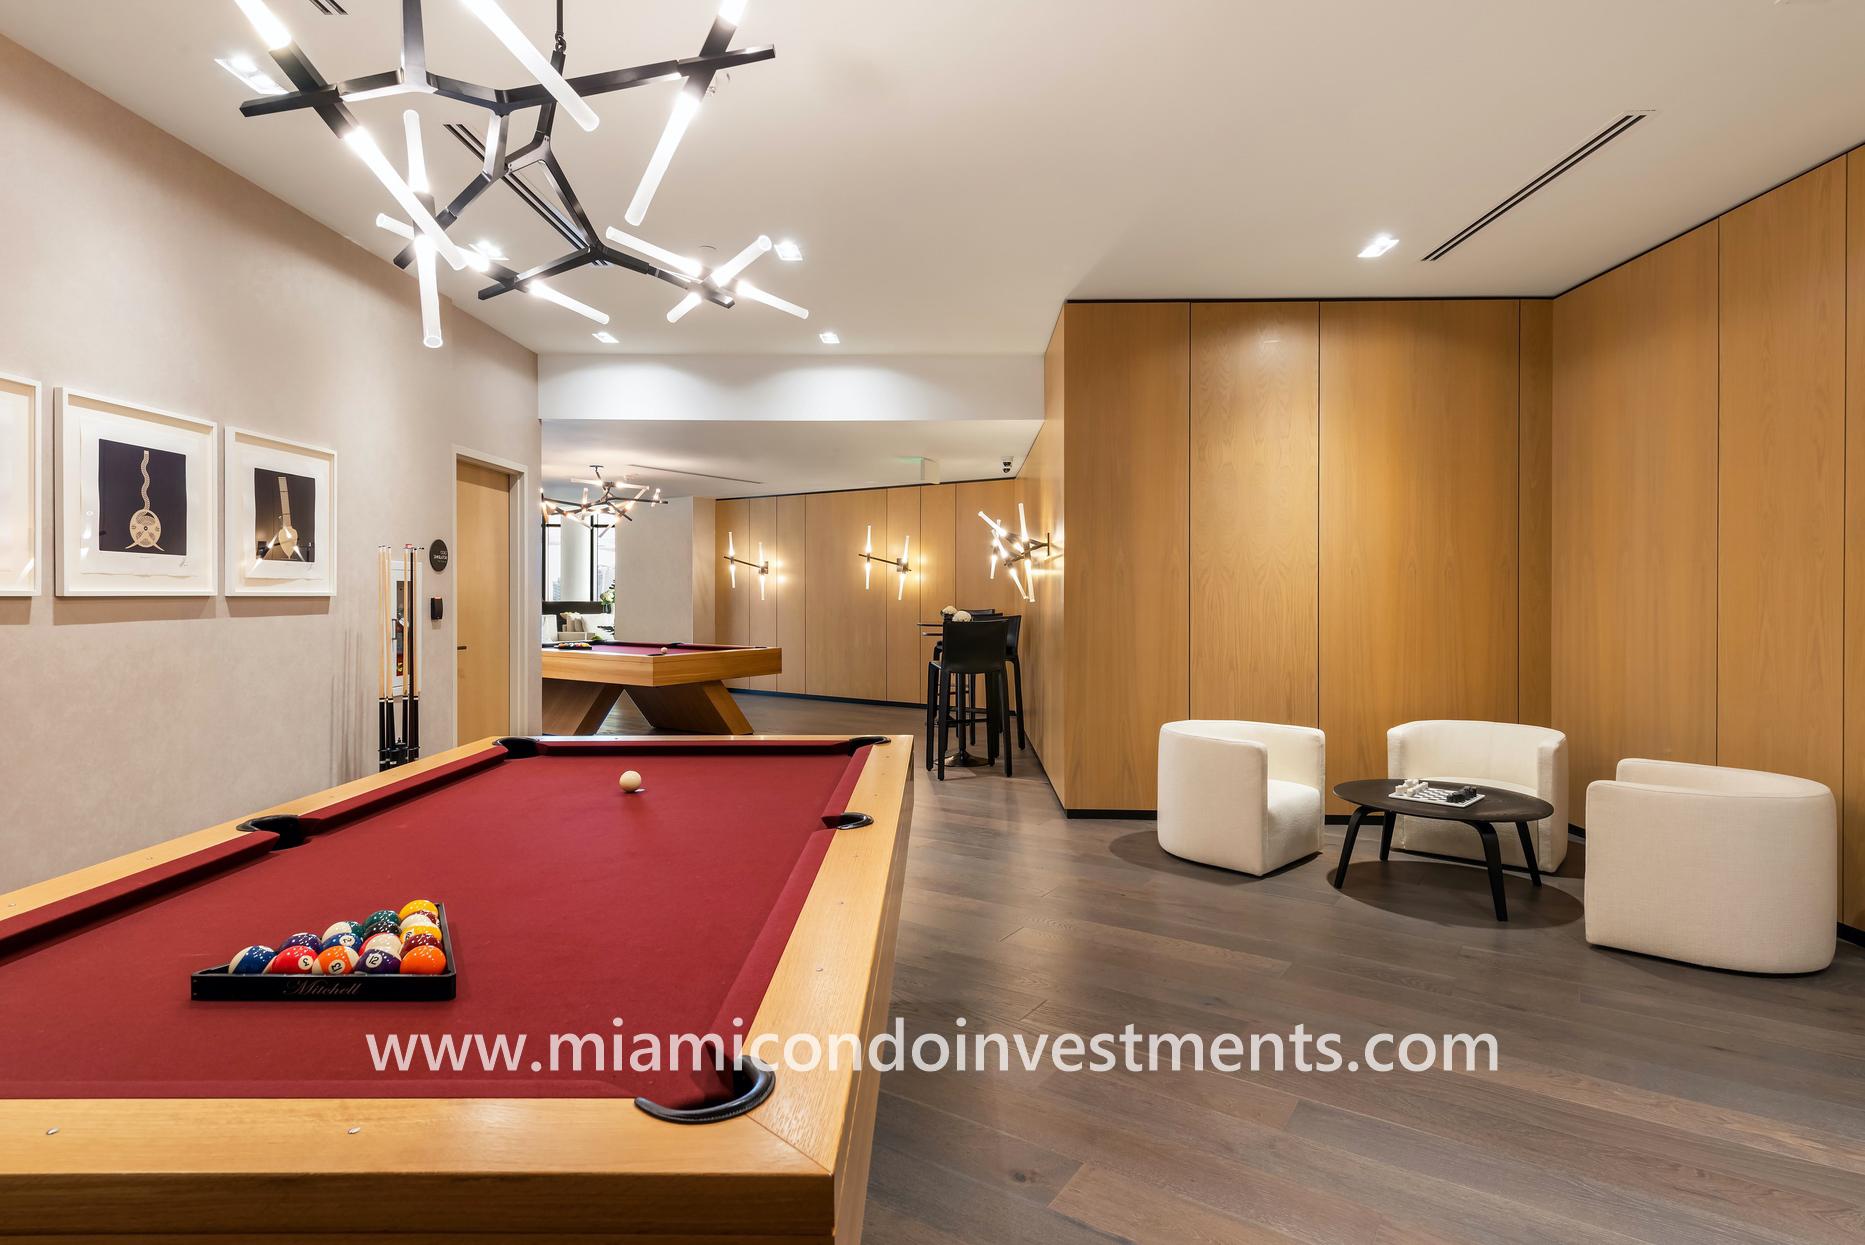 billiards room at Gran Paraiso